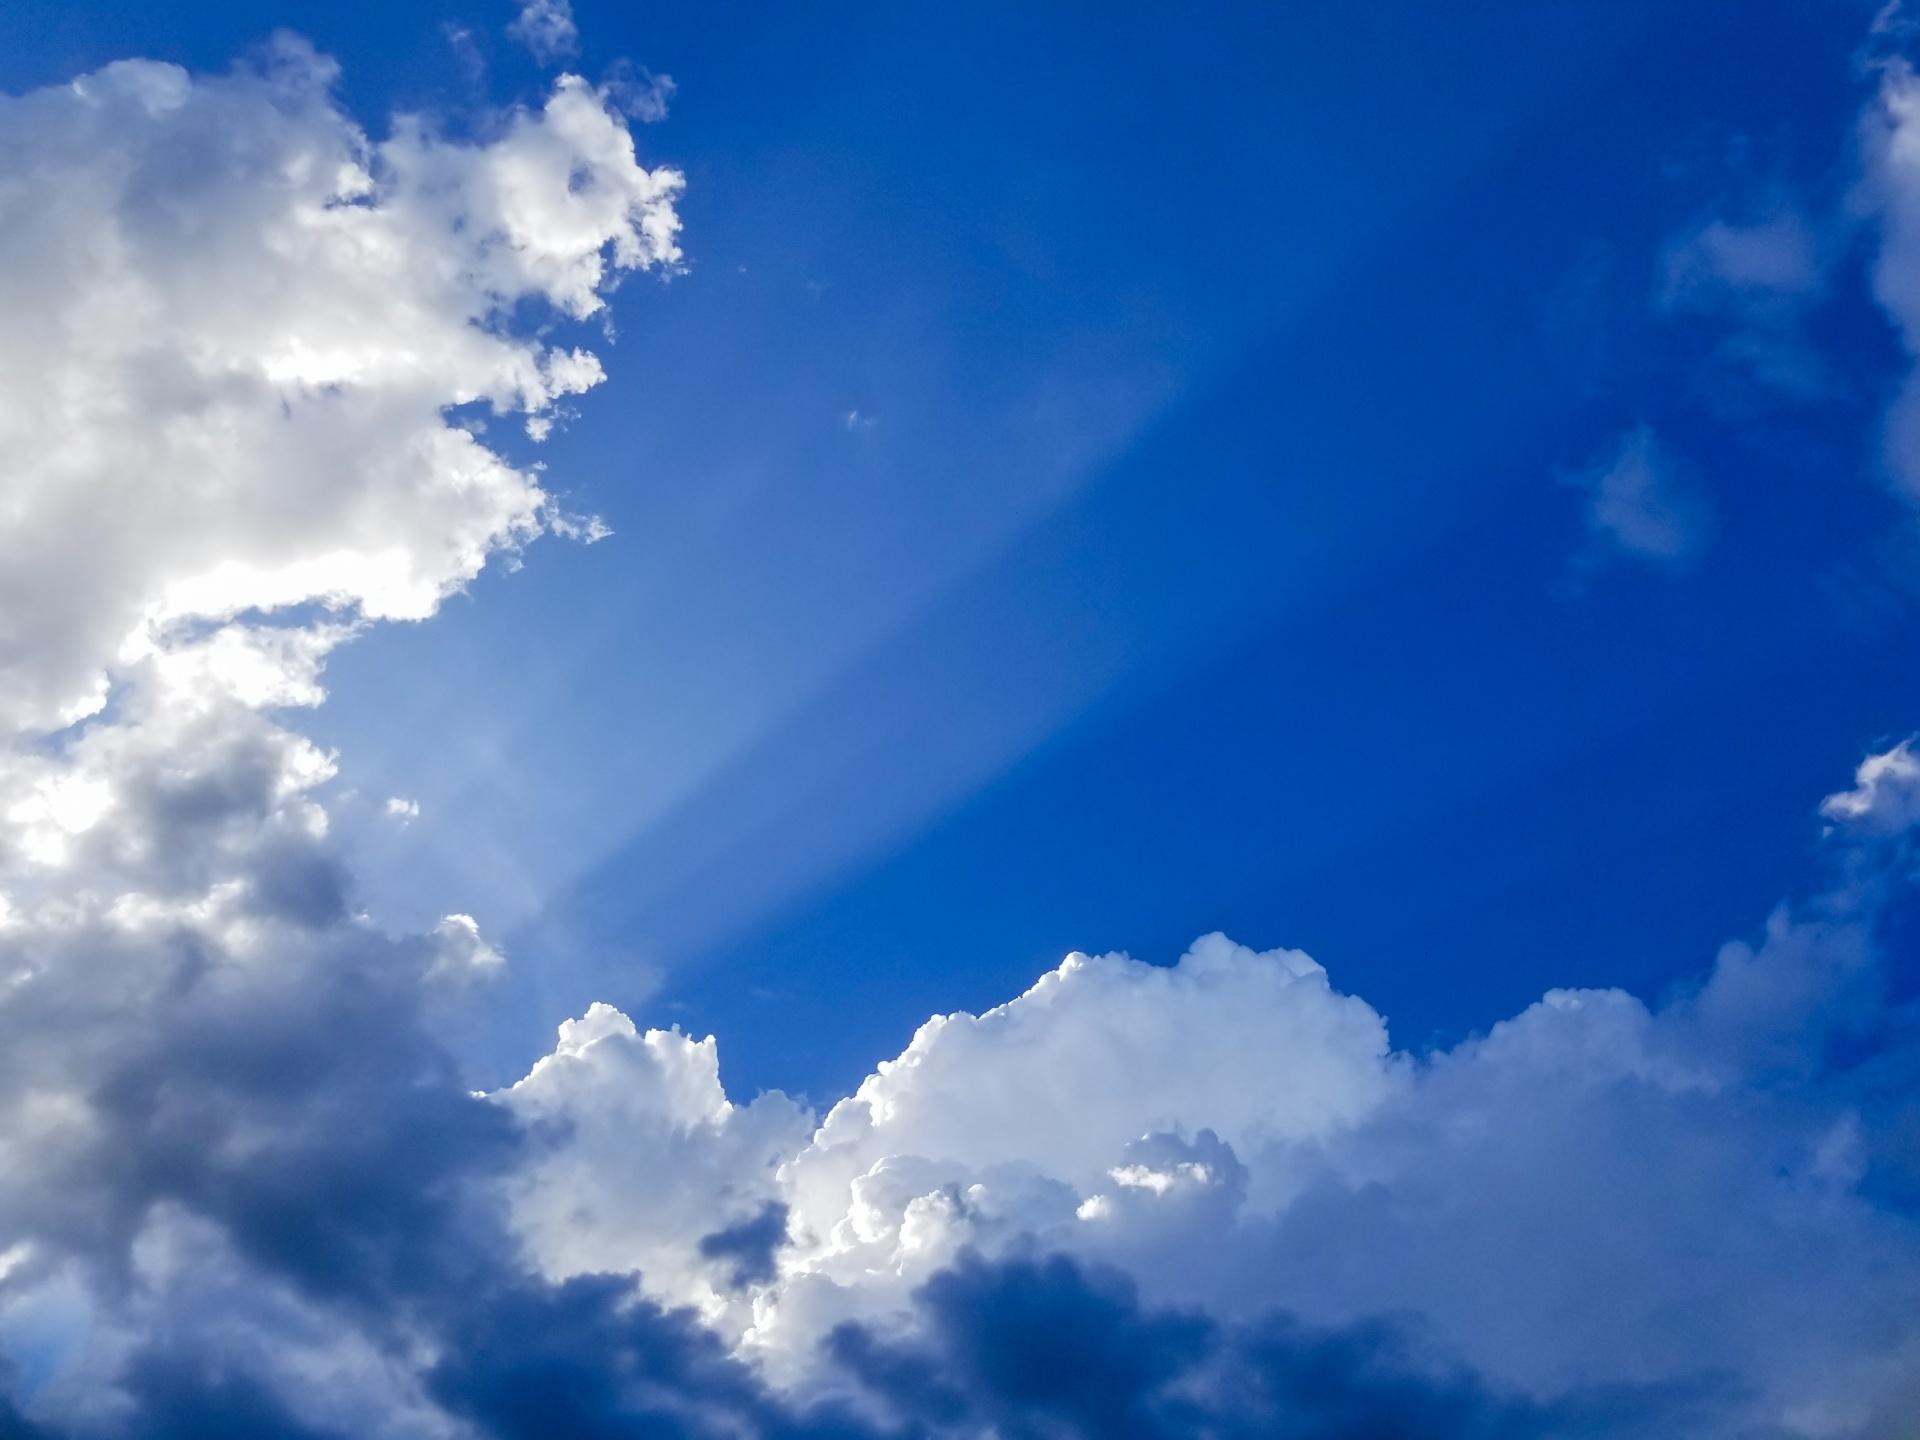 https://www.publicdomainpictures.net/en/view-image.php?image=247167&picture=sun-rays-through-clouds